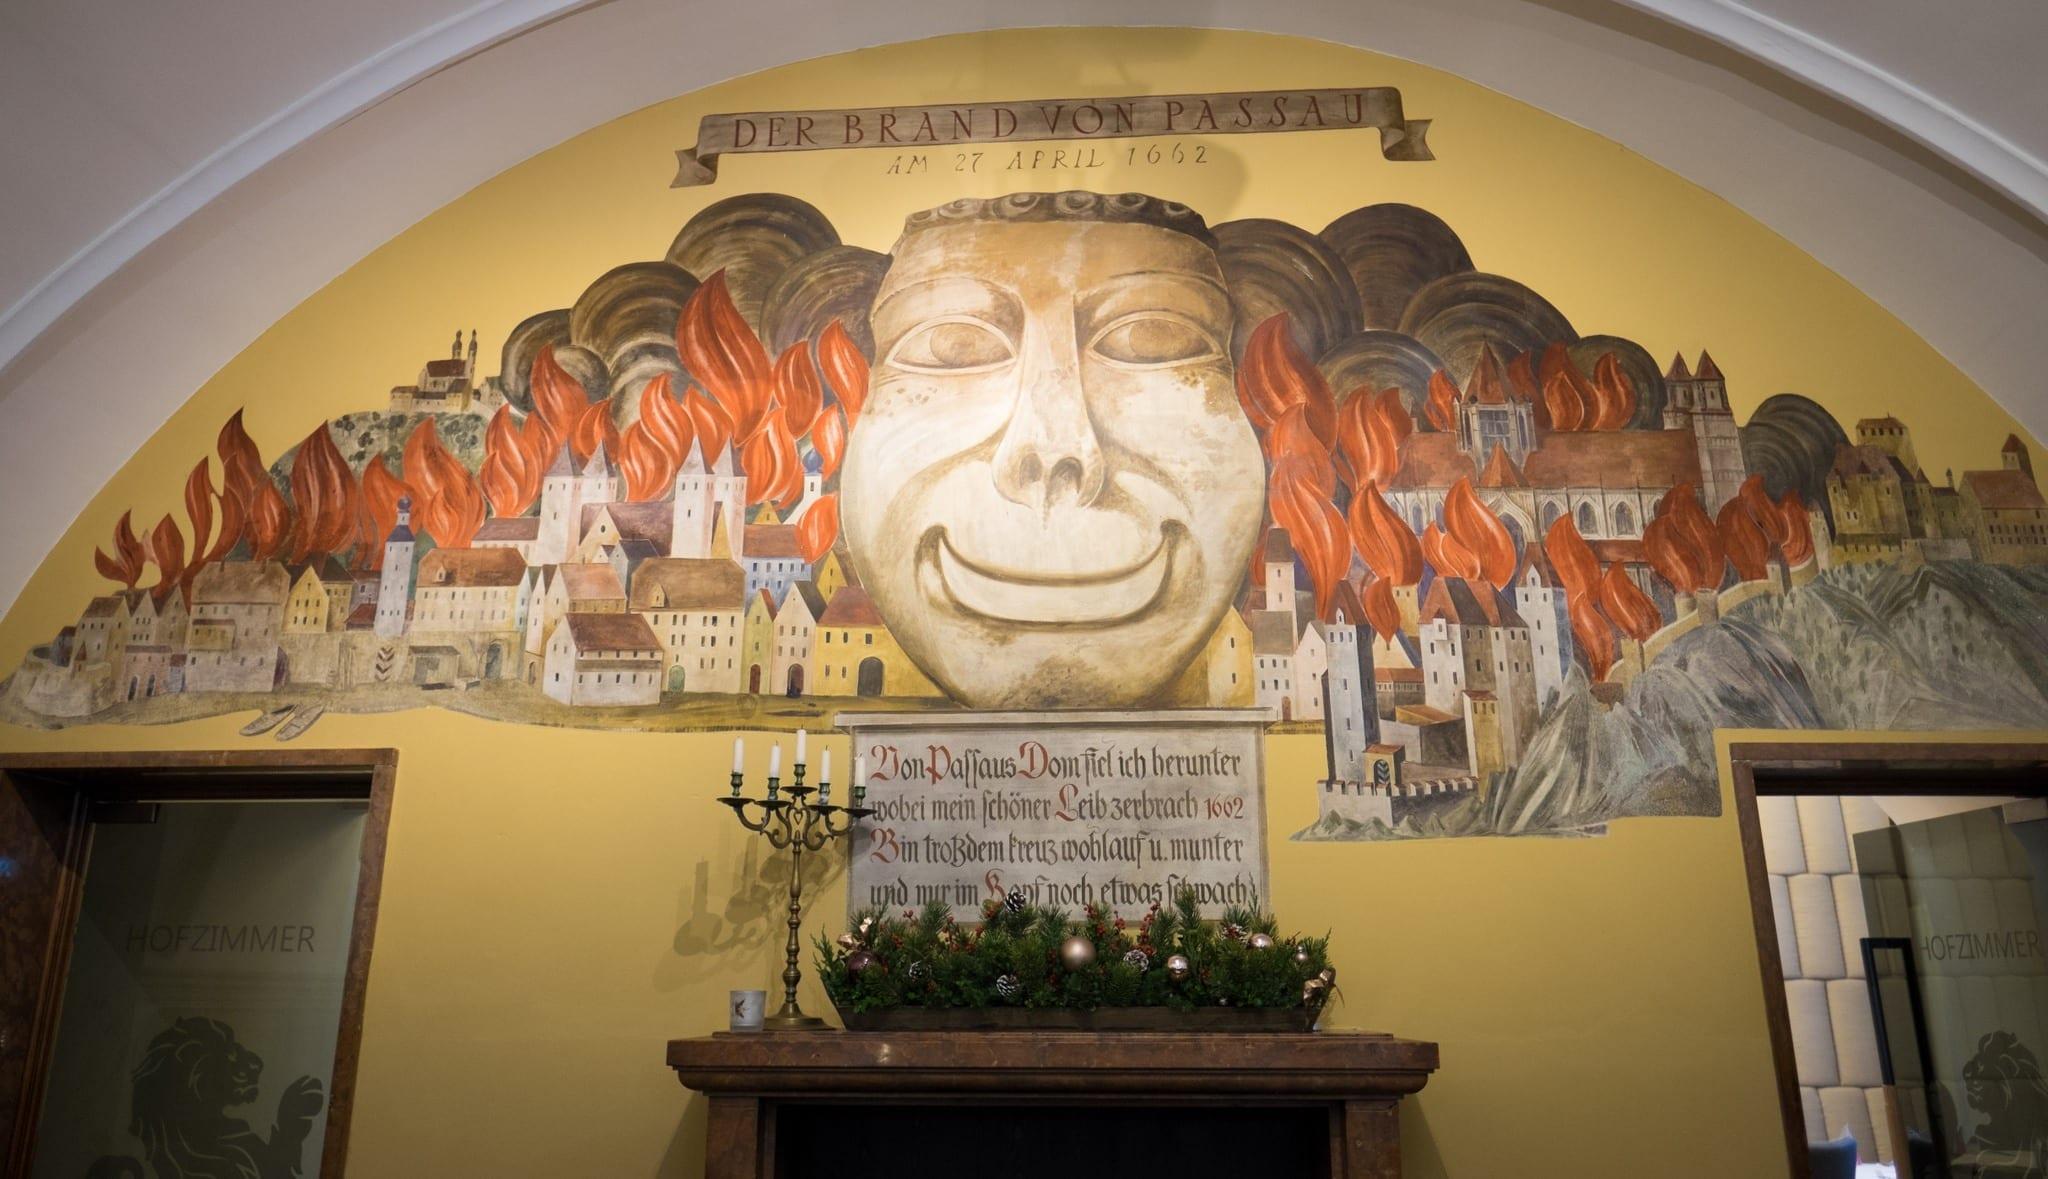 Passau Fire Christmas in Bavaria